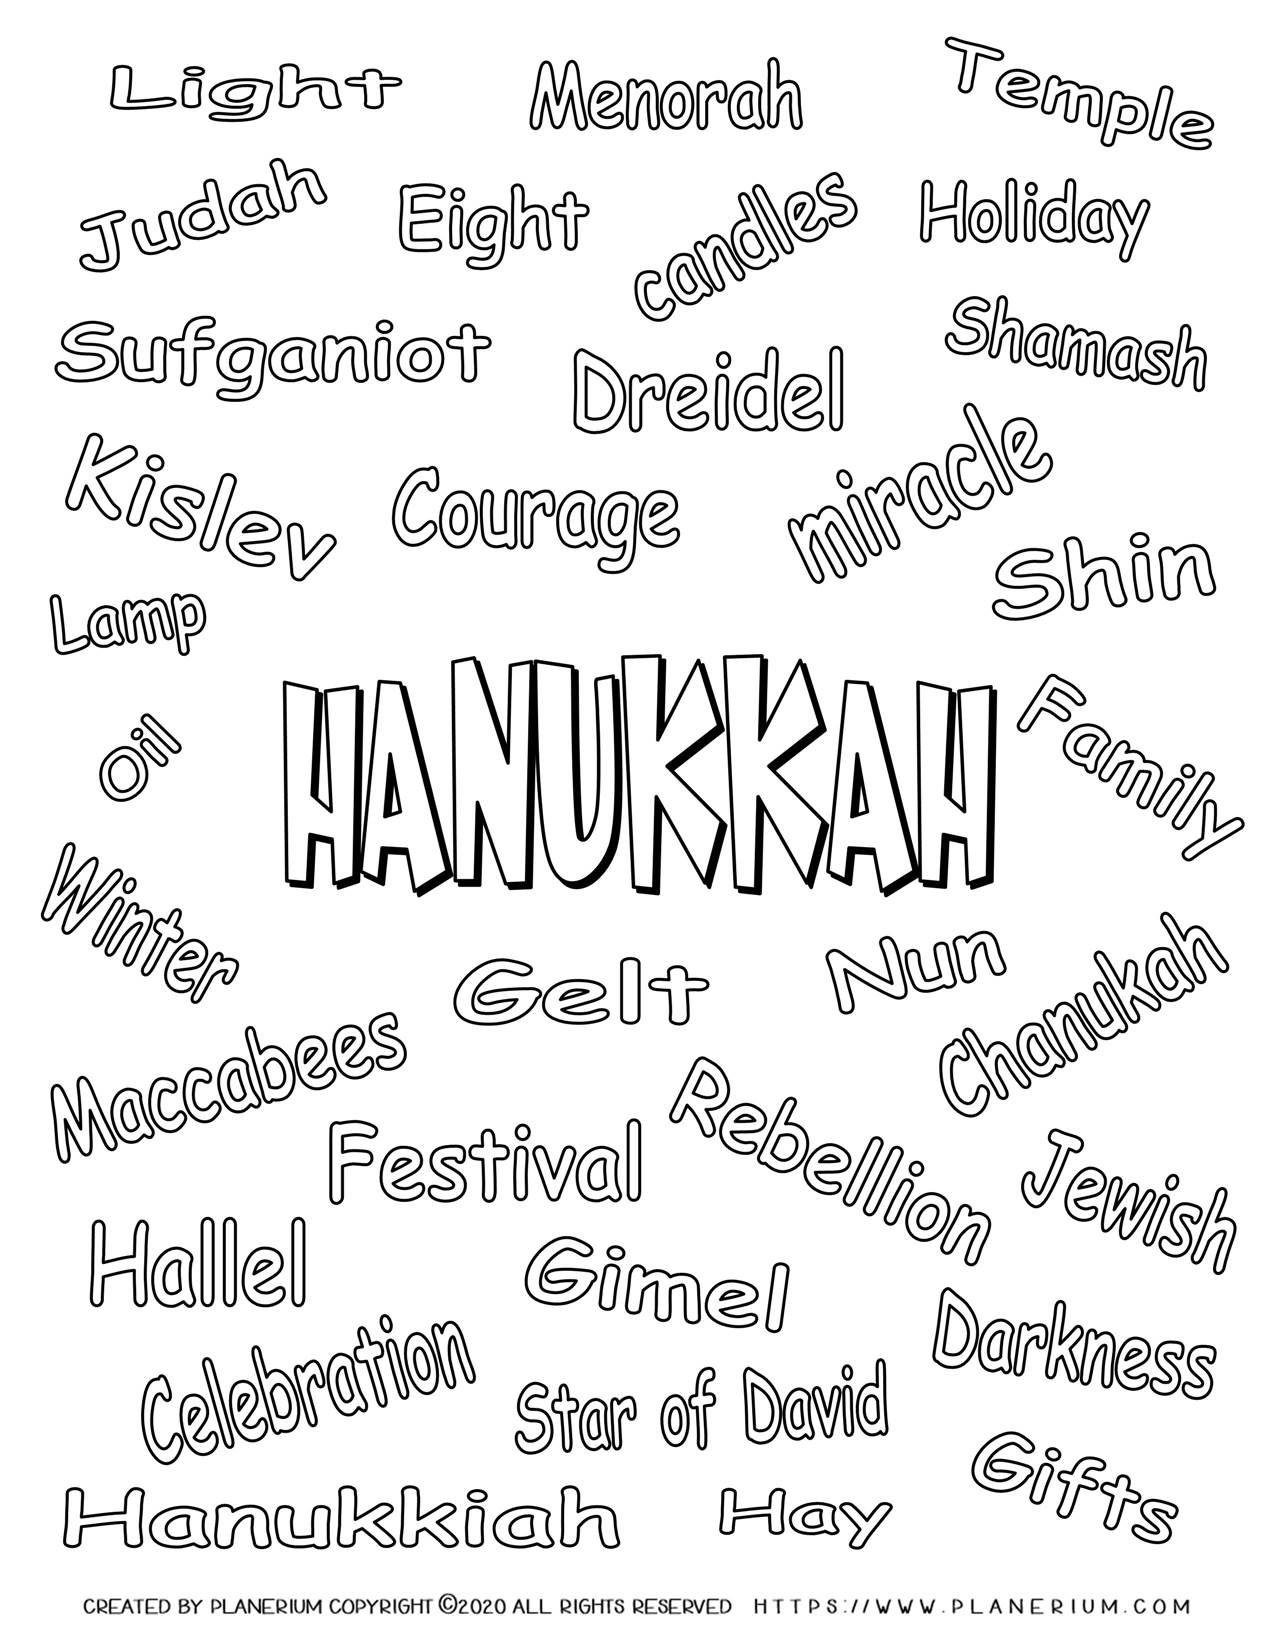 Hanukkah Coloring Page Related Words Free Printable Planerium Word Free Teacher Activities Free Printable Worksheets [ 1650 x 1275 Pixel ]